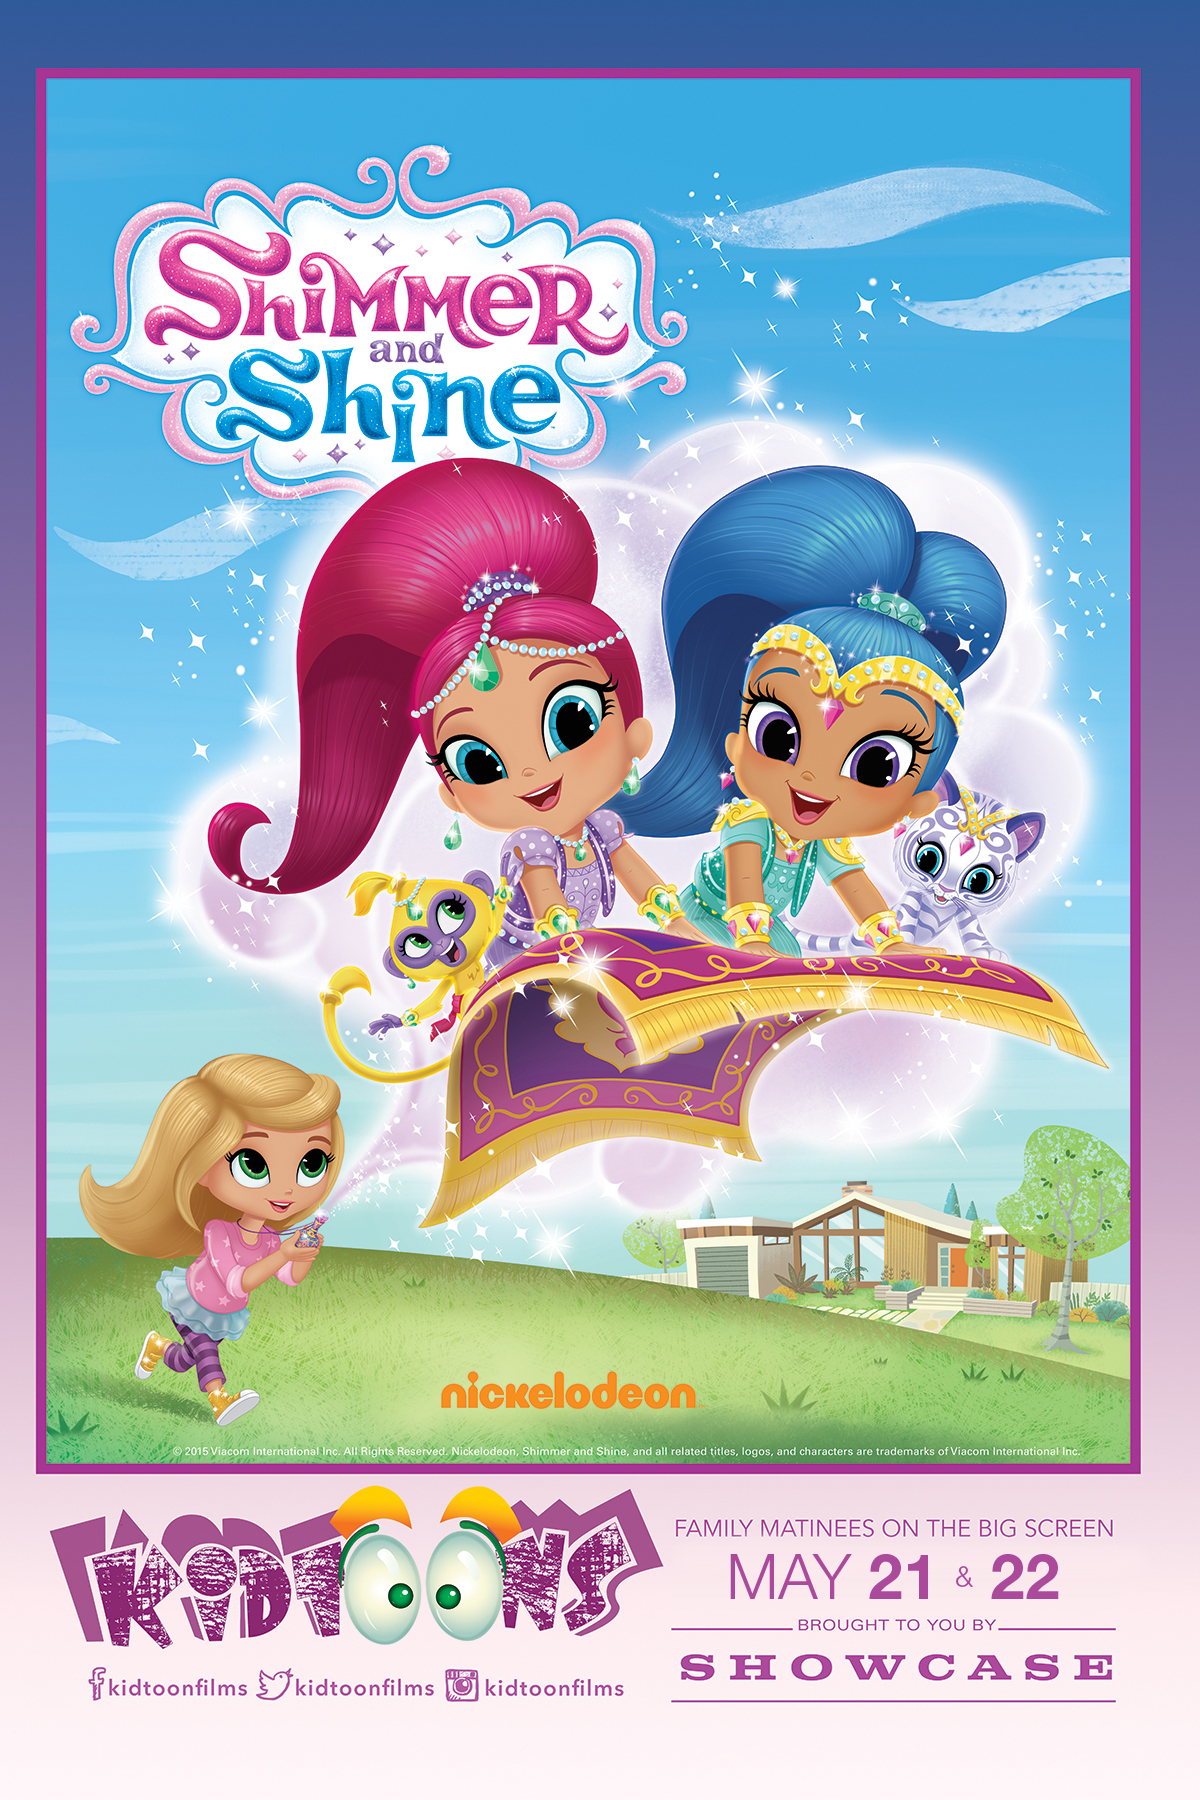 Kidtoons: Shimmer & Shine